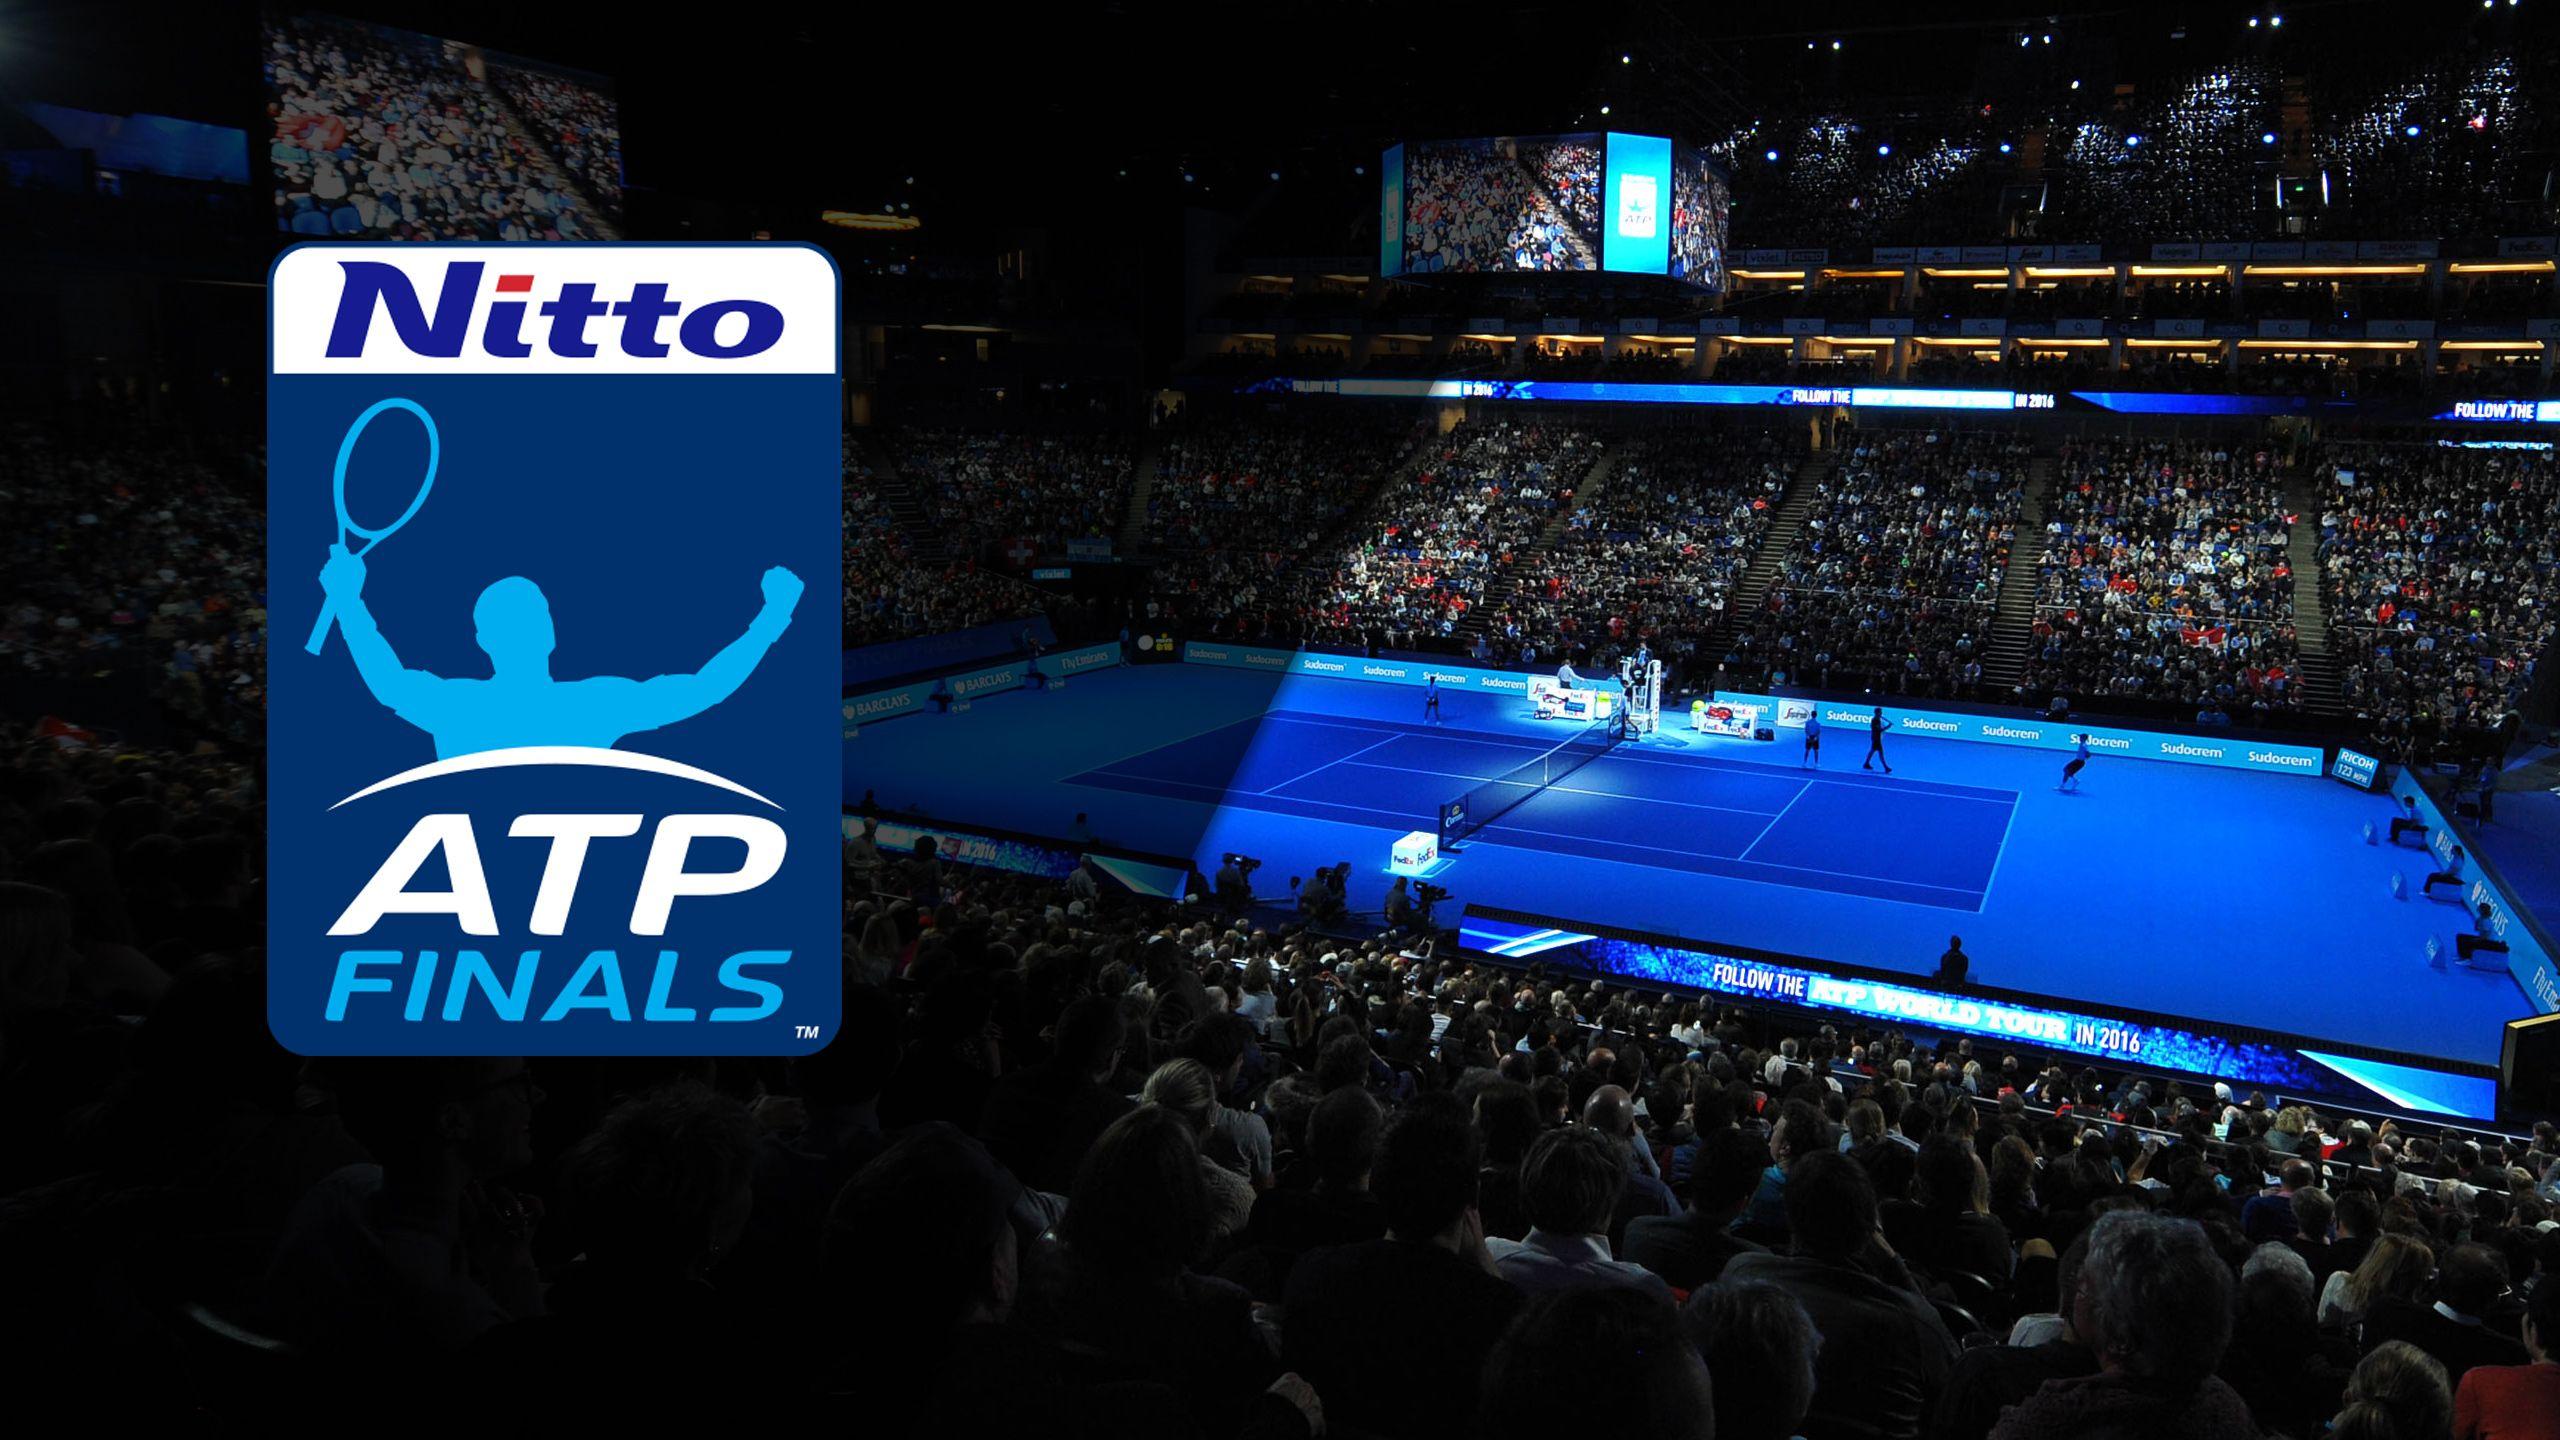 J. Murray/B. Soares vs. H. Kontinen/J. Peers - Nitto ATP Finals (Doubles Semifinal #2)